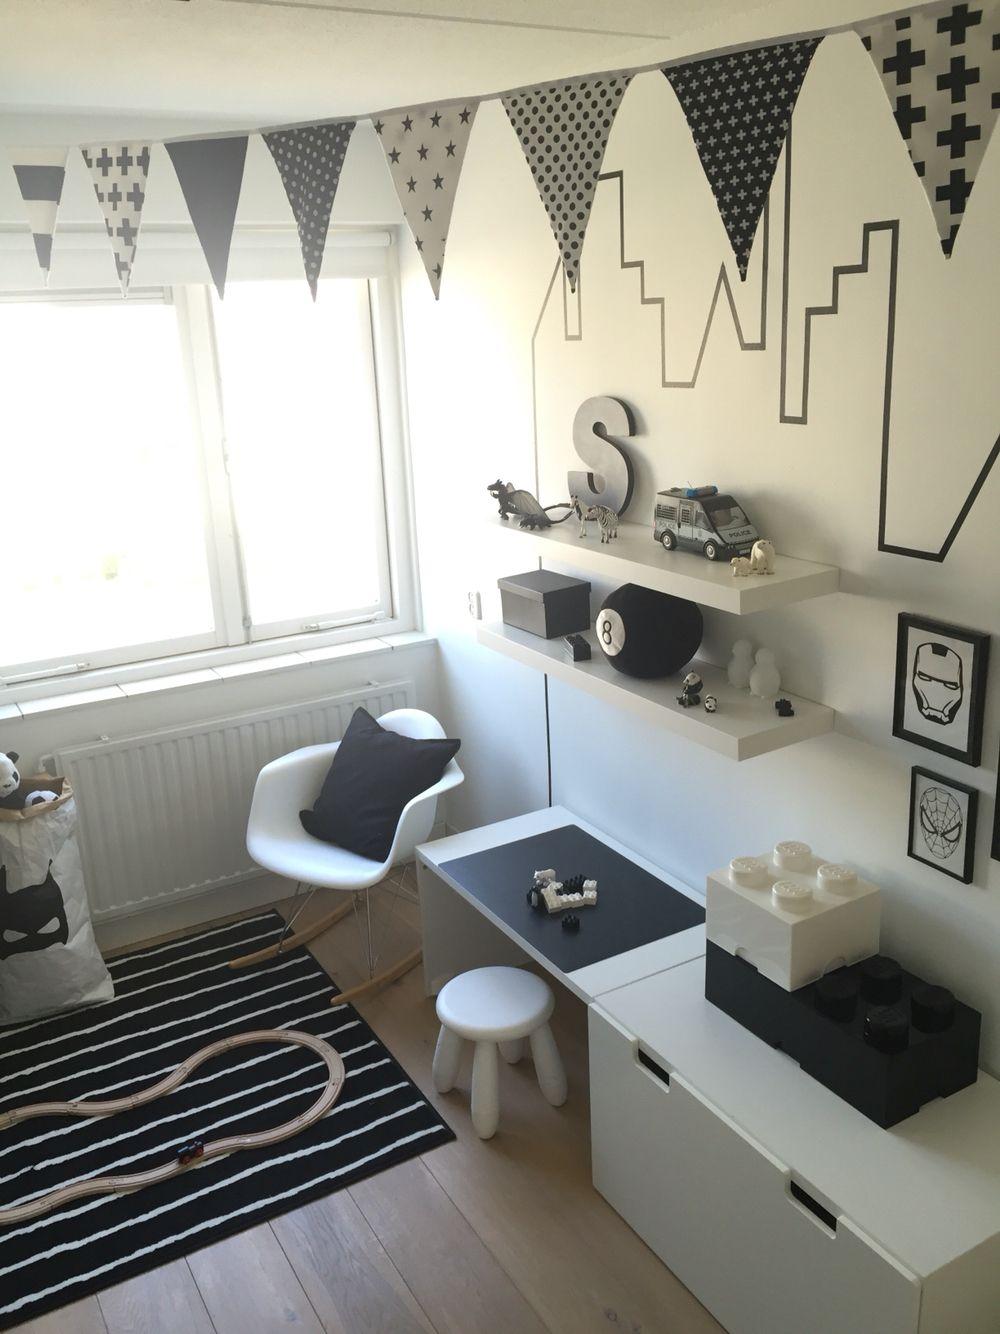 Superhero Room Design: Monochrome Kids Bedroom With Superhero Theme Bedroom